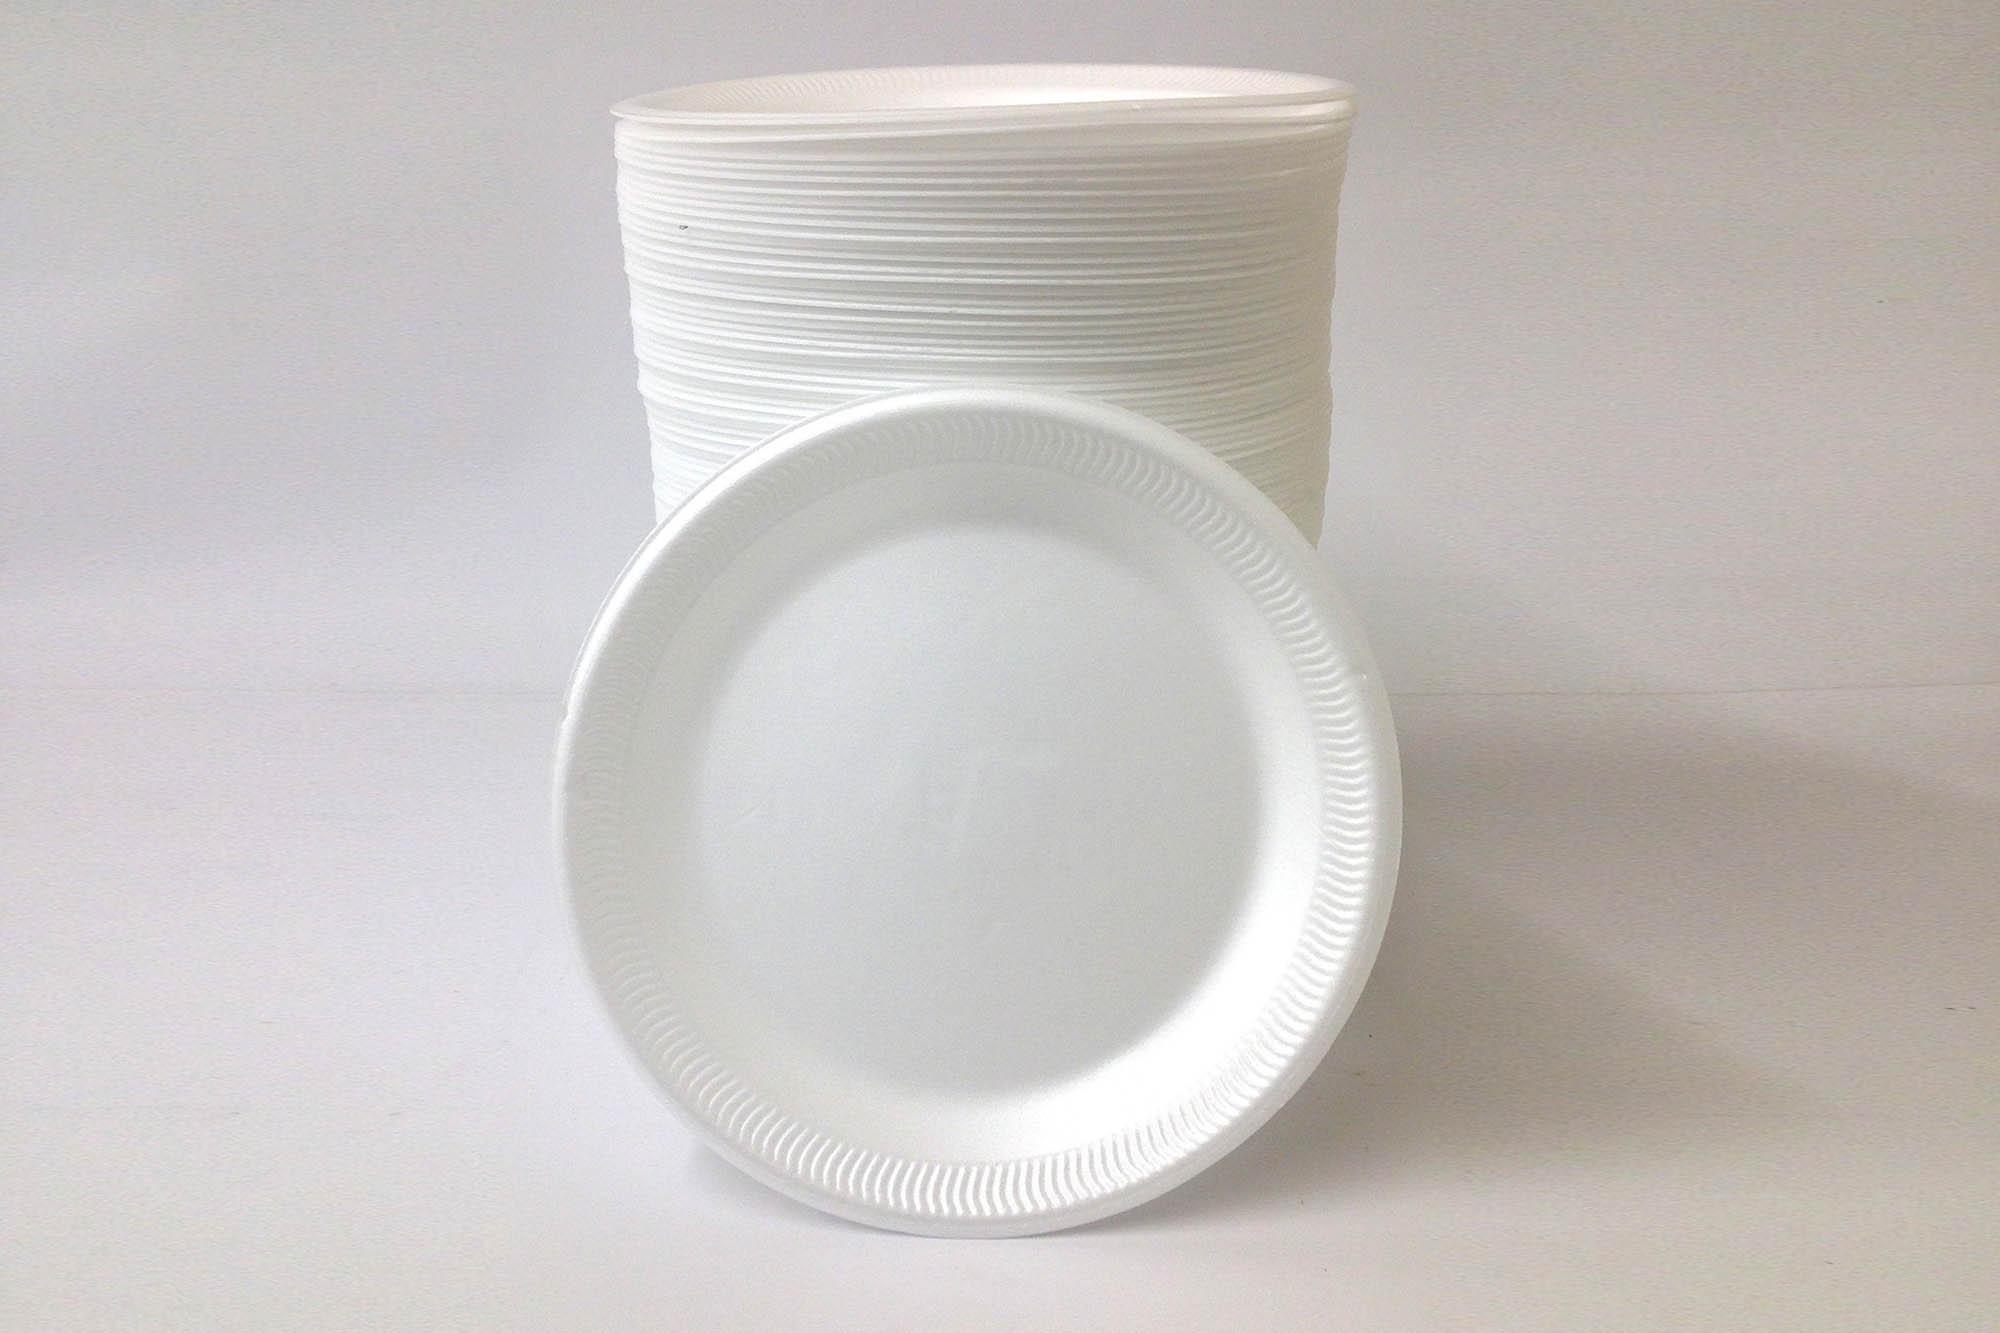 Polysterine plates